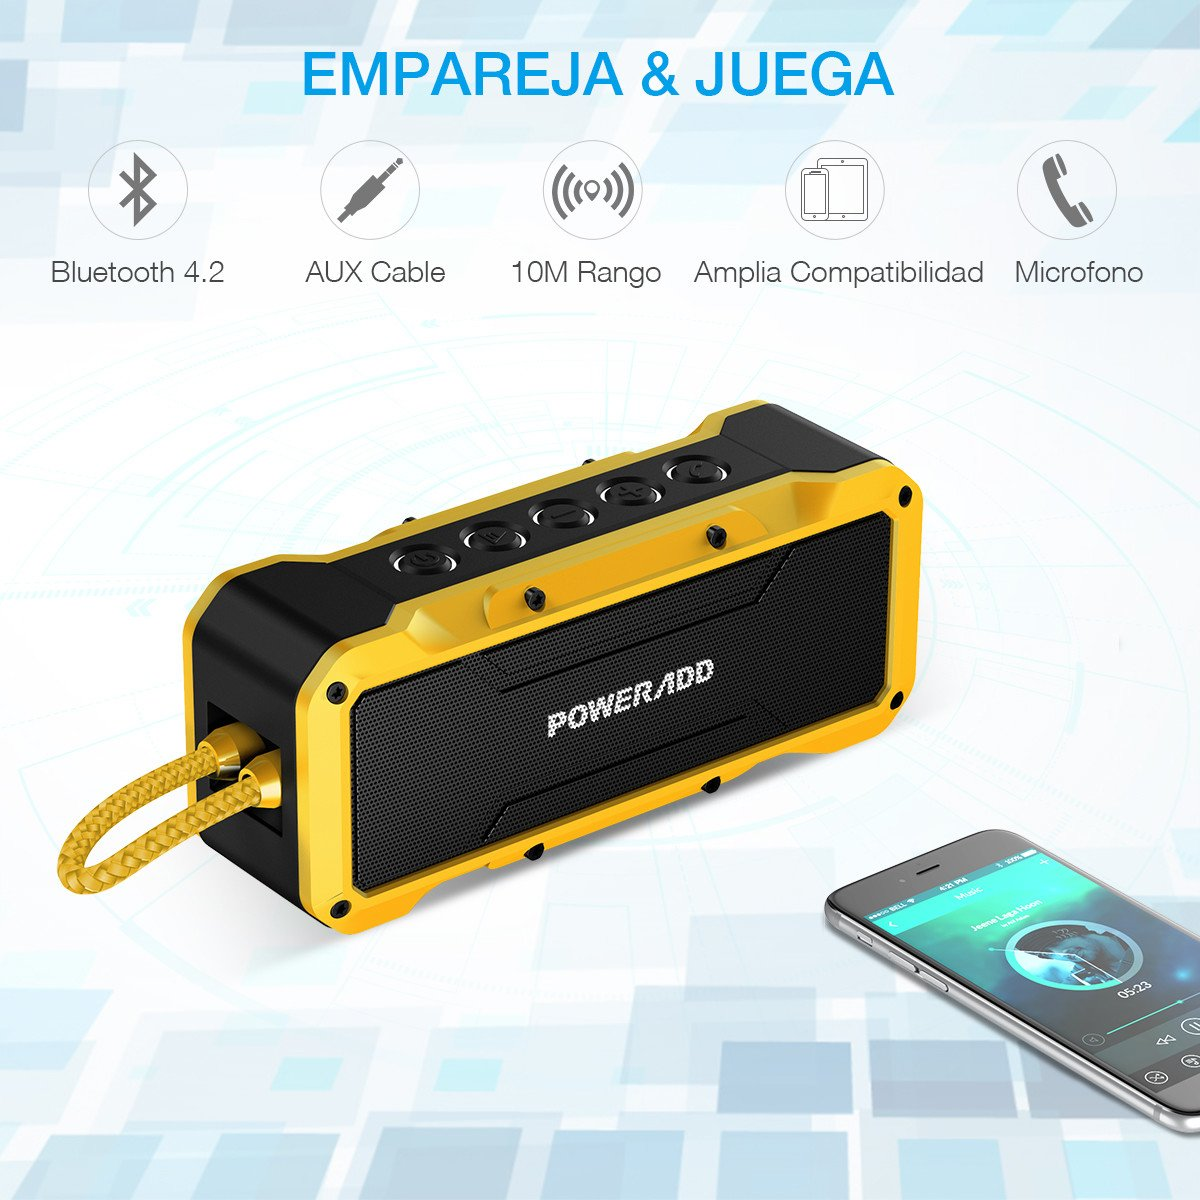 Poweradd MusicFly Altavoz Bluetooth Portátil con Impermeable IPX7,Antigolpes,Resisdente a Arena, Sonido Potente de 36W, Bluetooth 4.2 Con Aux Cable, Amarillo-Negro